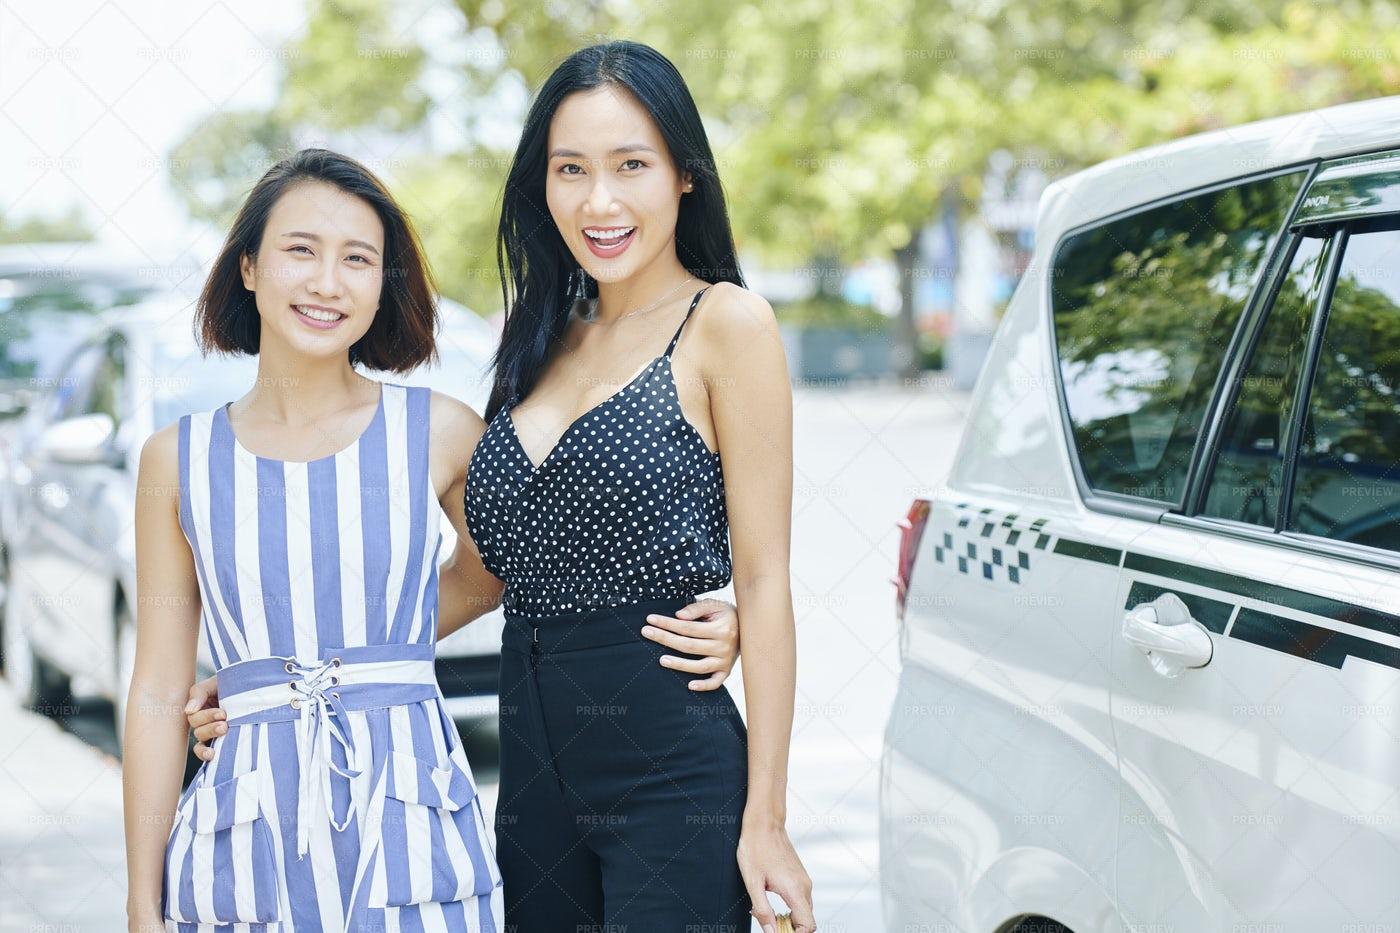 Asian Women In The City: Stock Photos